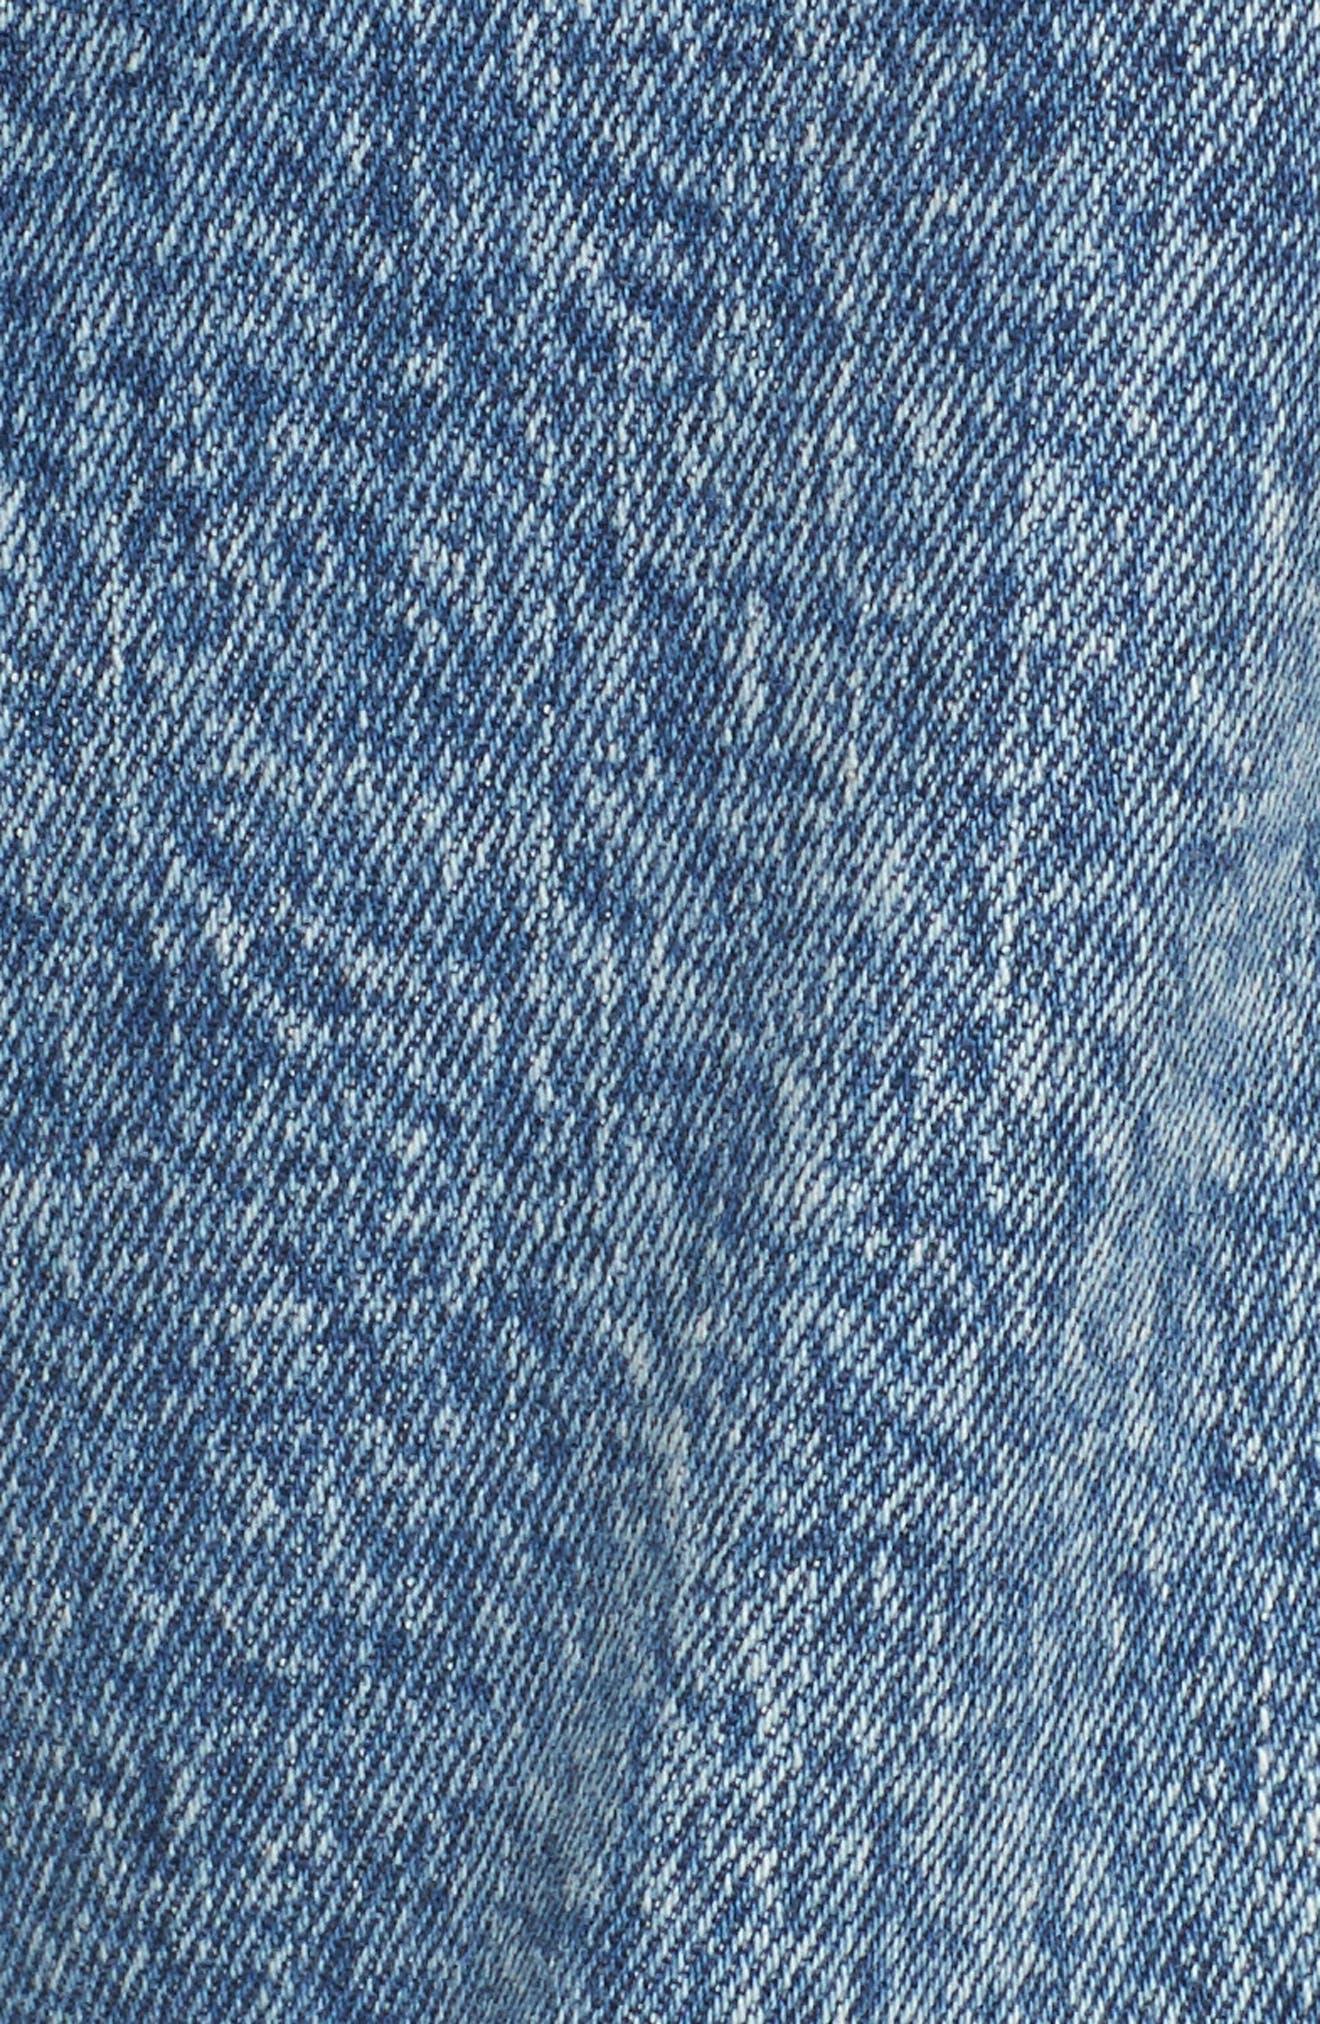 Noella Straight Leg Crop Jeans,                             Alternate thumbnail 6, color,                             Westlyn Destructed